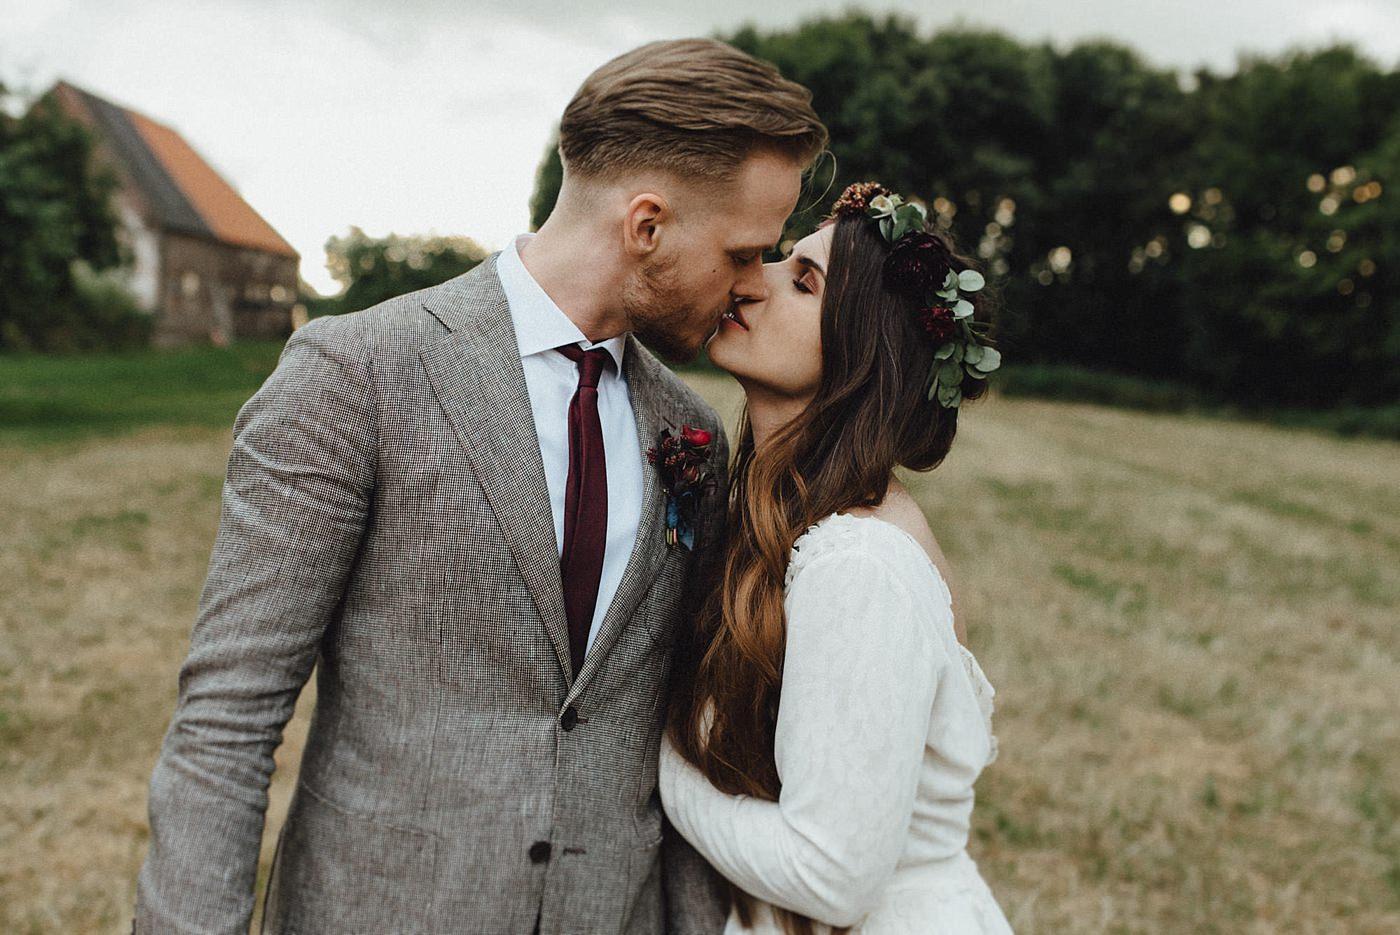 urban-elopement-wedding-229